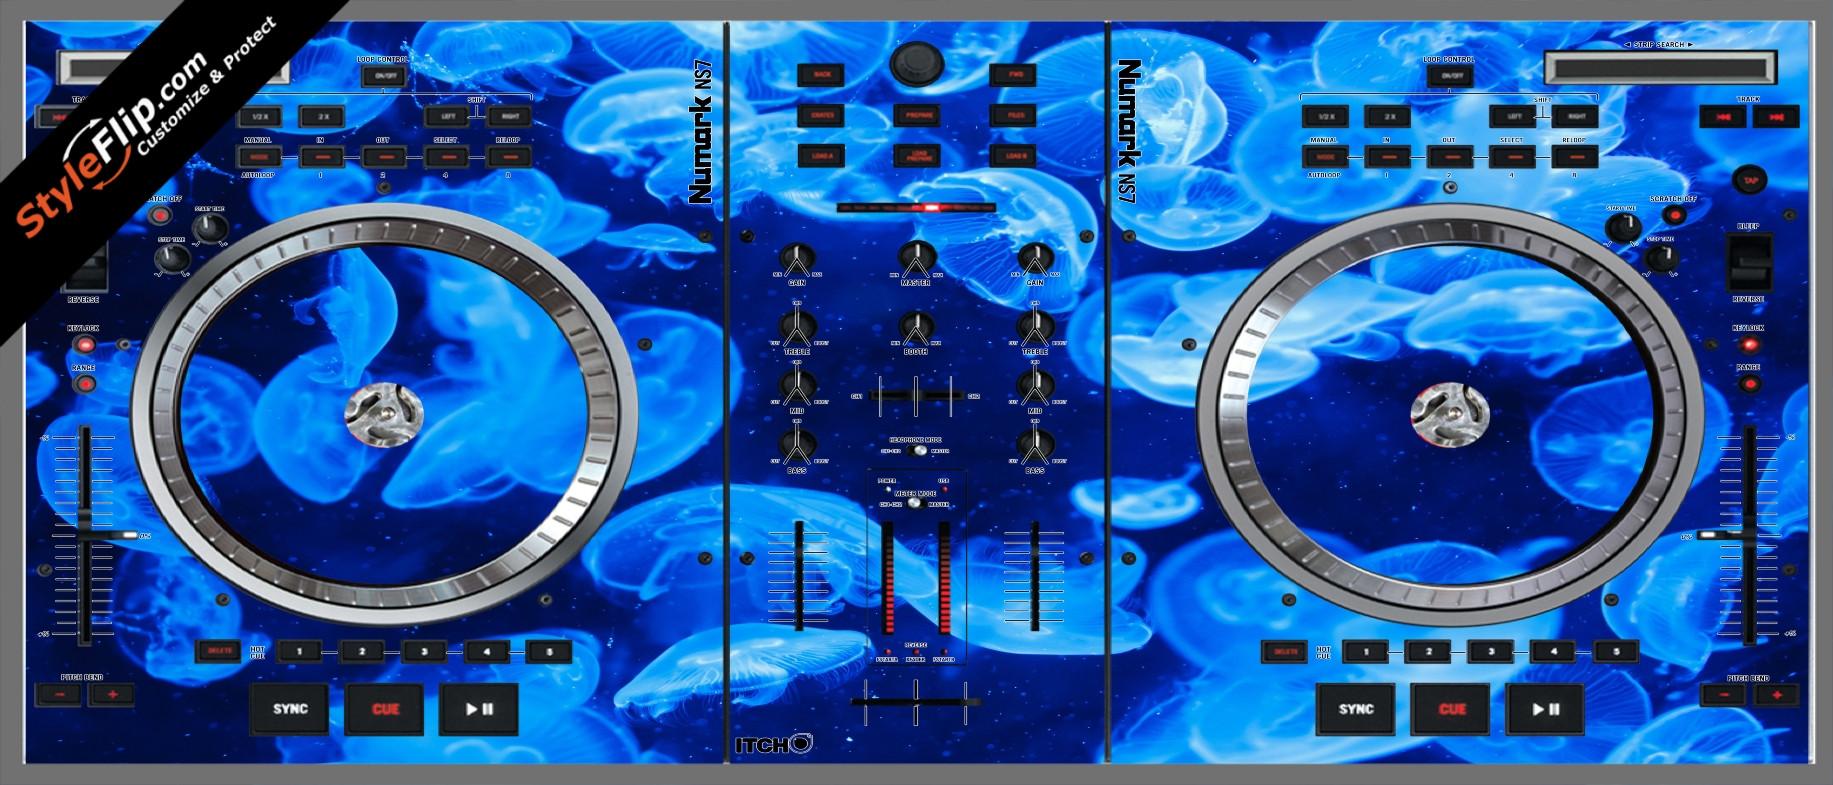 Jellyfish Numark NS-7